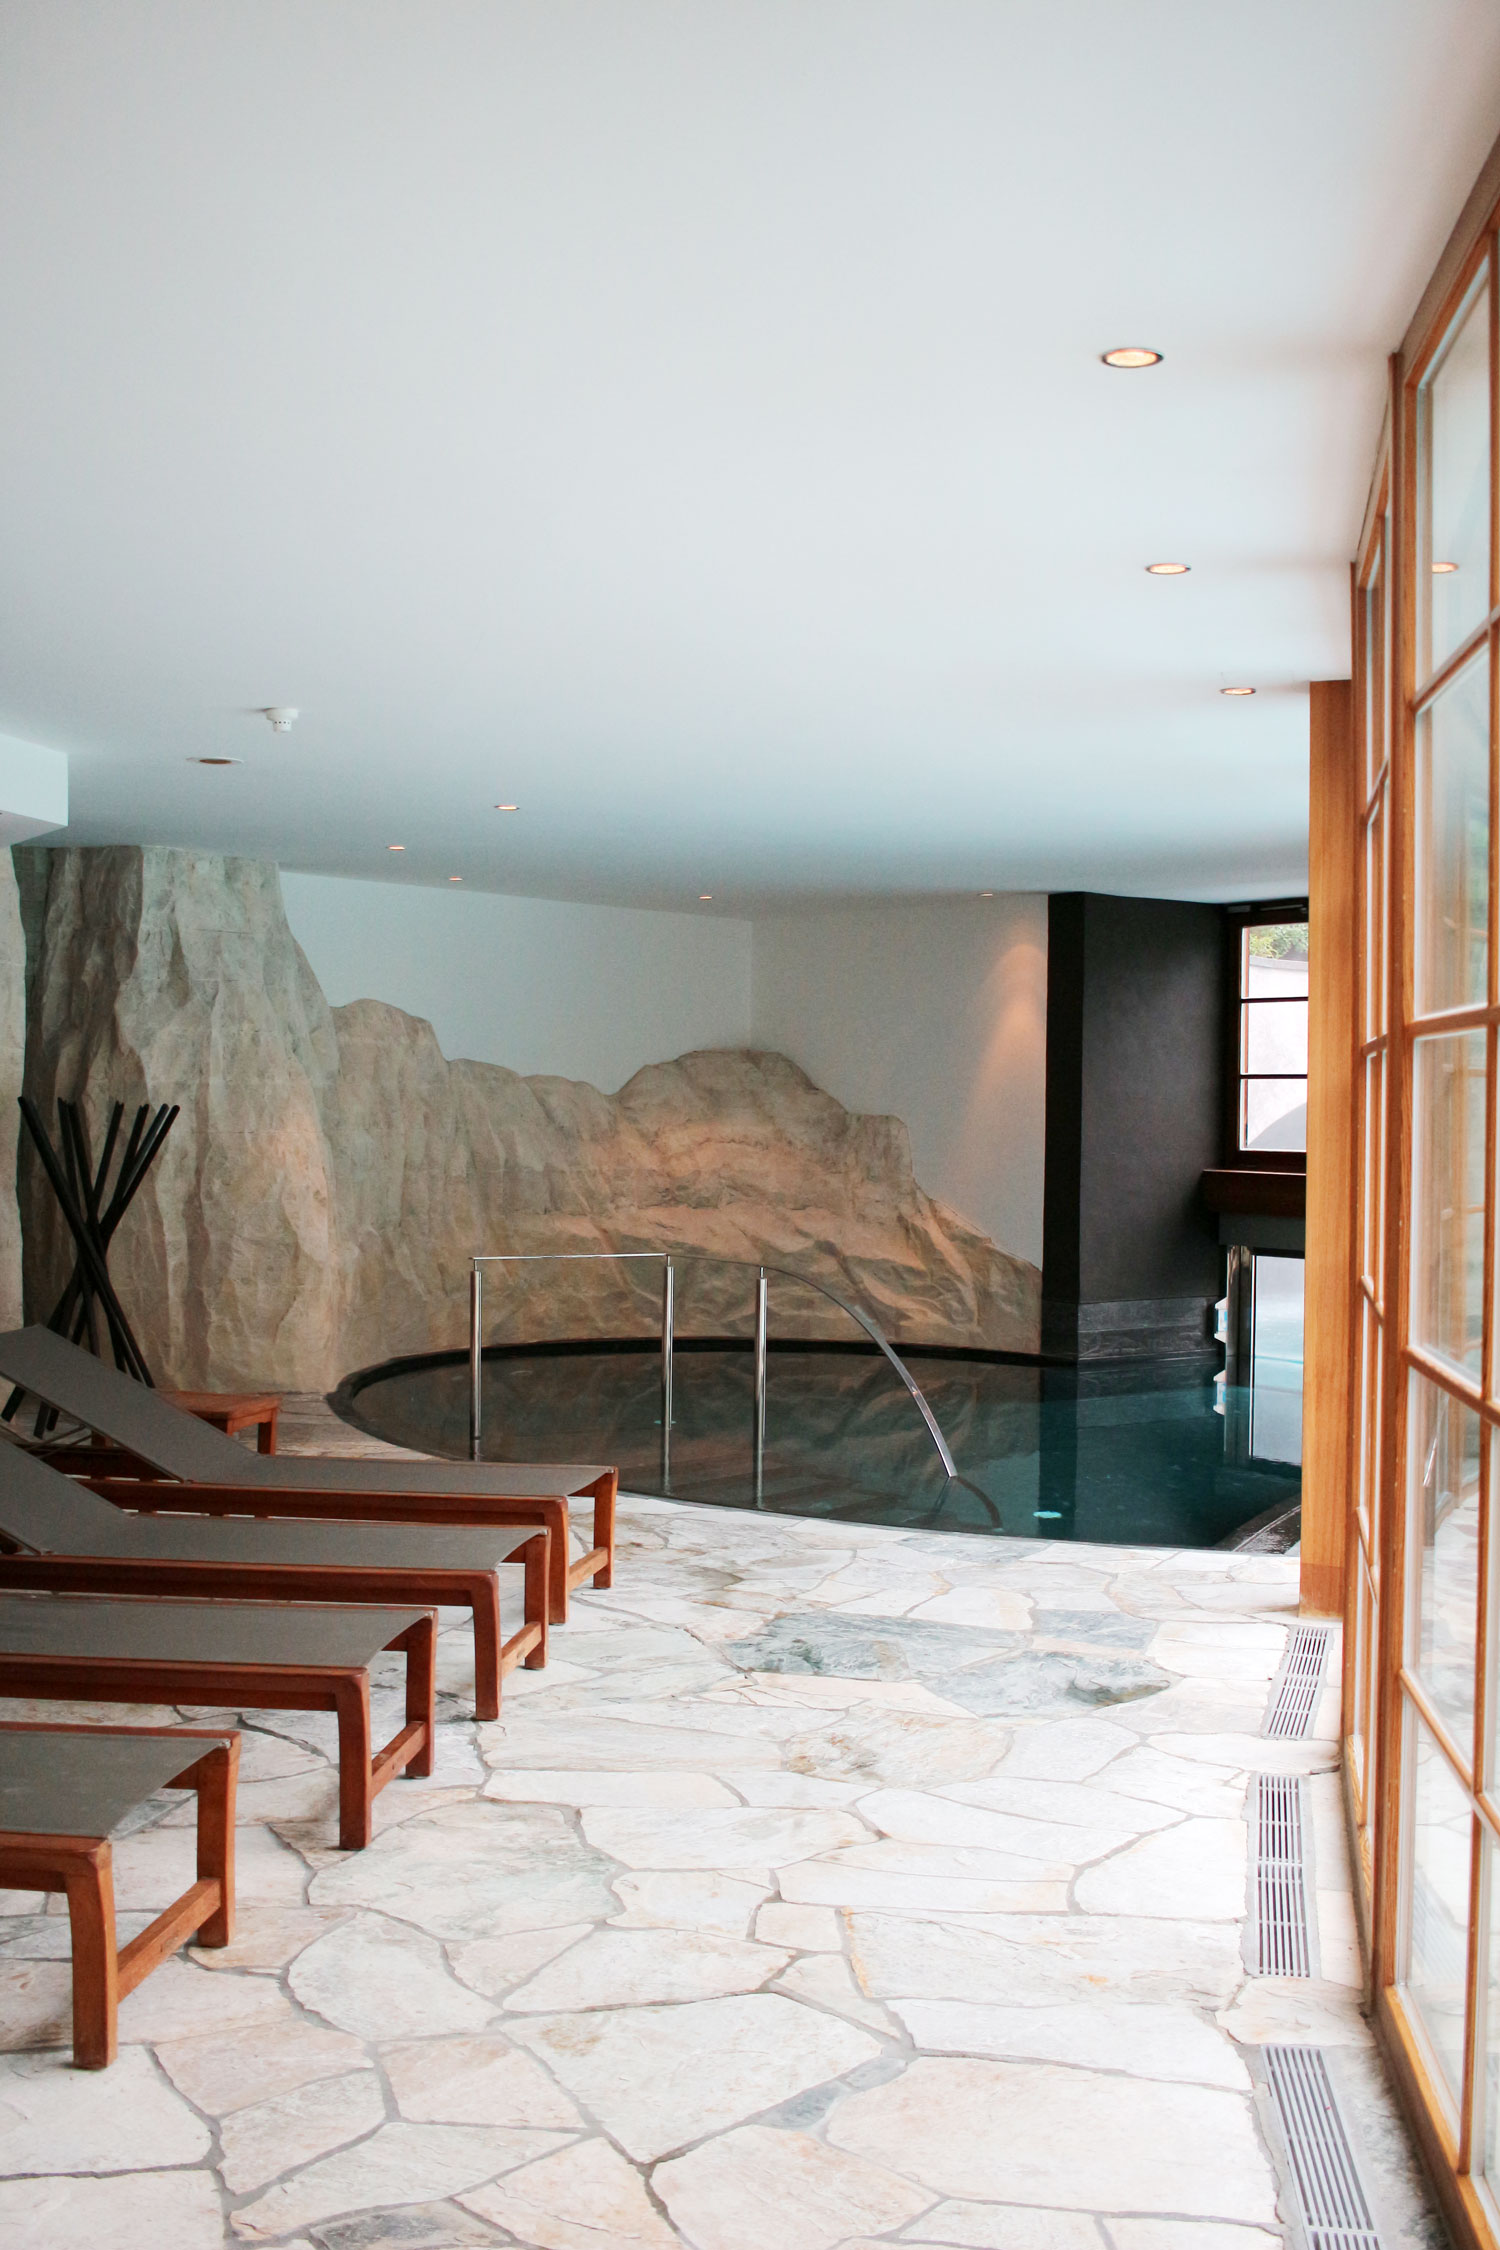 Italy-adler-dolomiti-hotel-spa-resort-review-travel-blogger-58